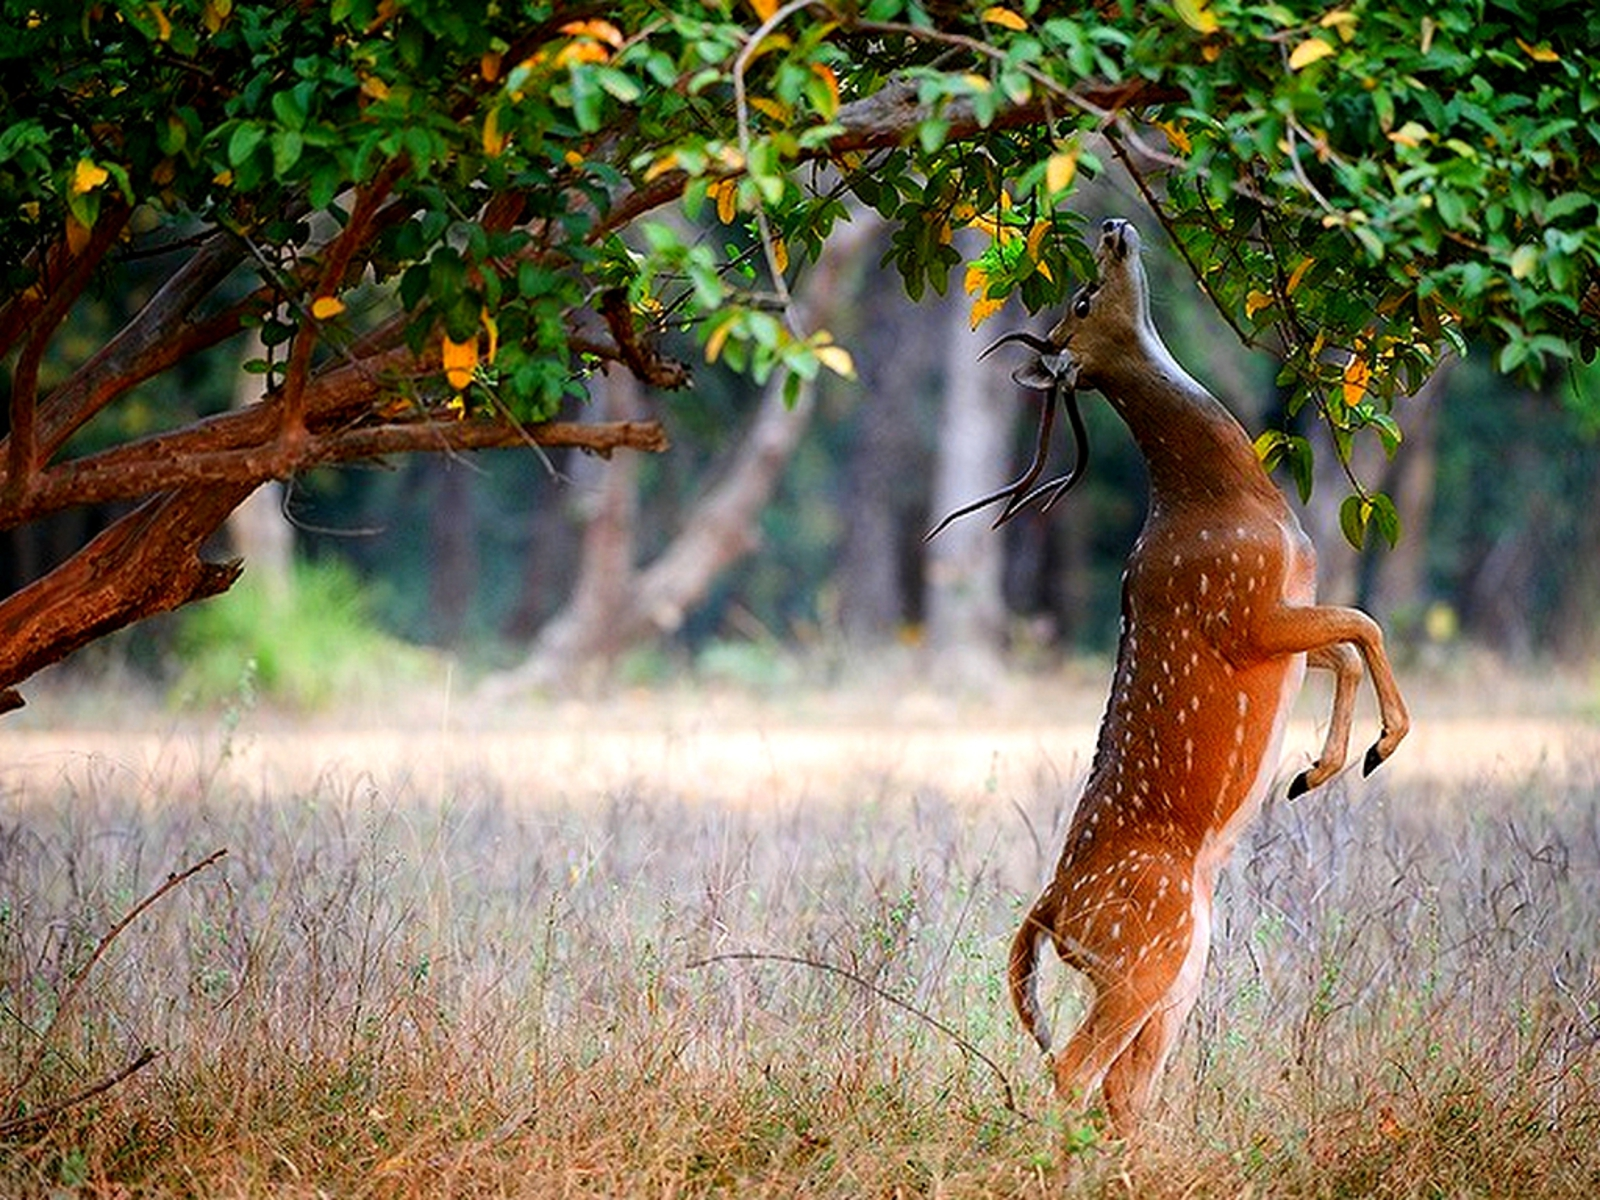 http://2.bp.blogspot.com/_EAViqbzwc_s/TN_RloJP9wI/AAAAAAAACCw/X9yEjZDZoRM/s1600/deer2.jpg